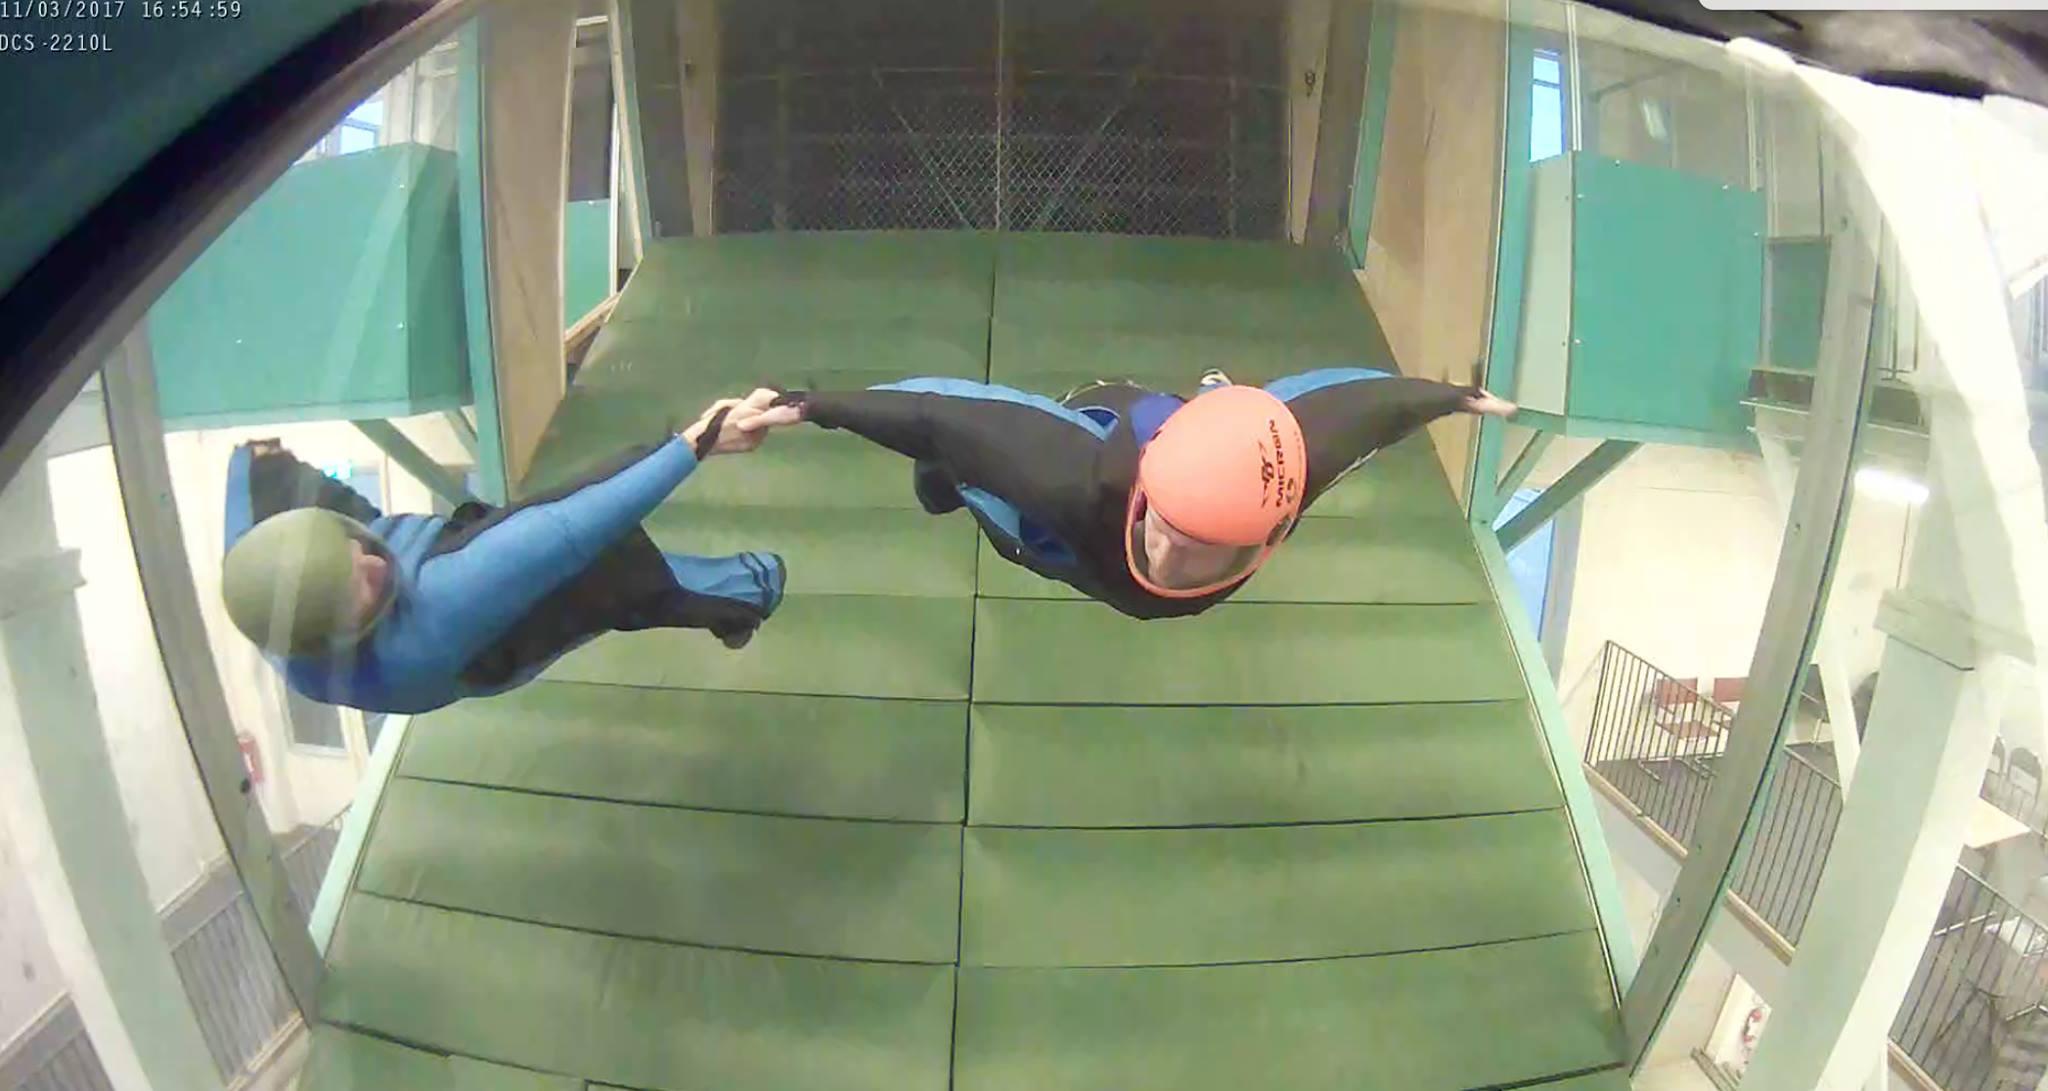 James flying in the indoor wingsuit wind tunnel.